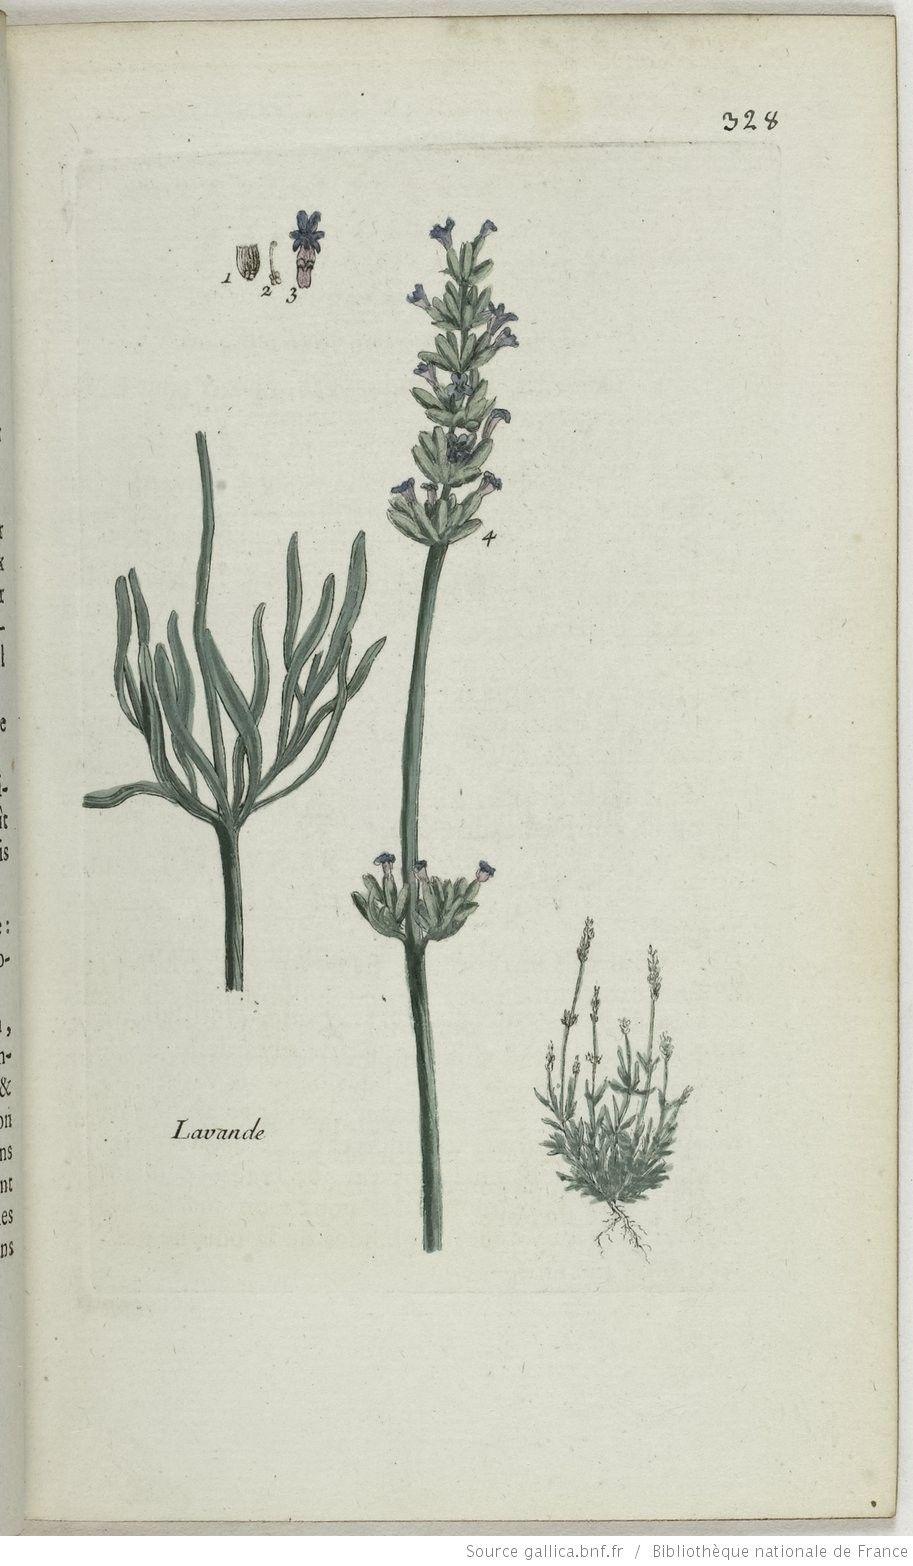 LAVANDULA - Lavandula spica. La lavande / Lavande femelle